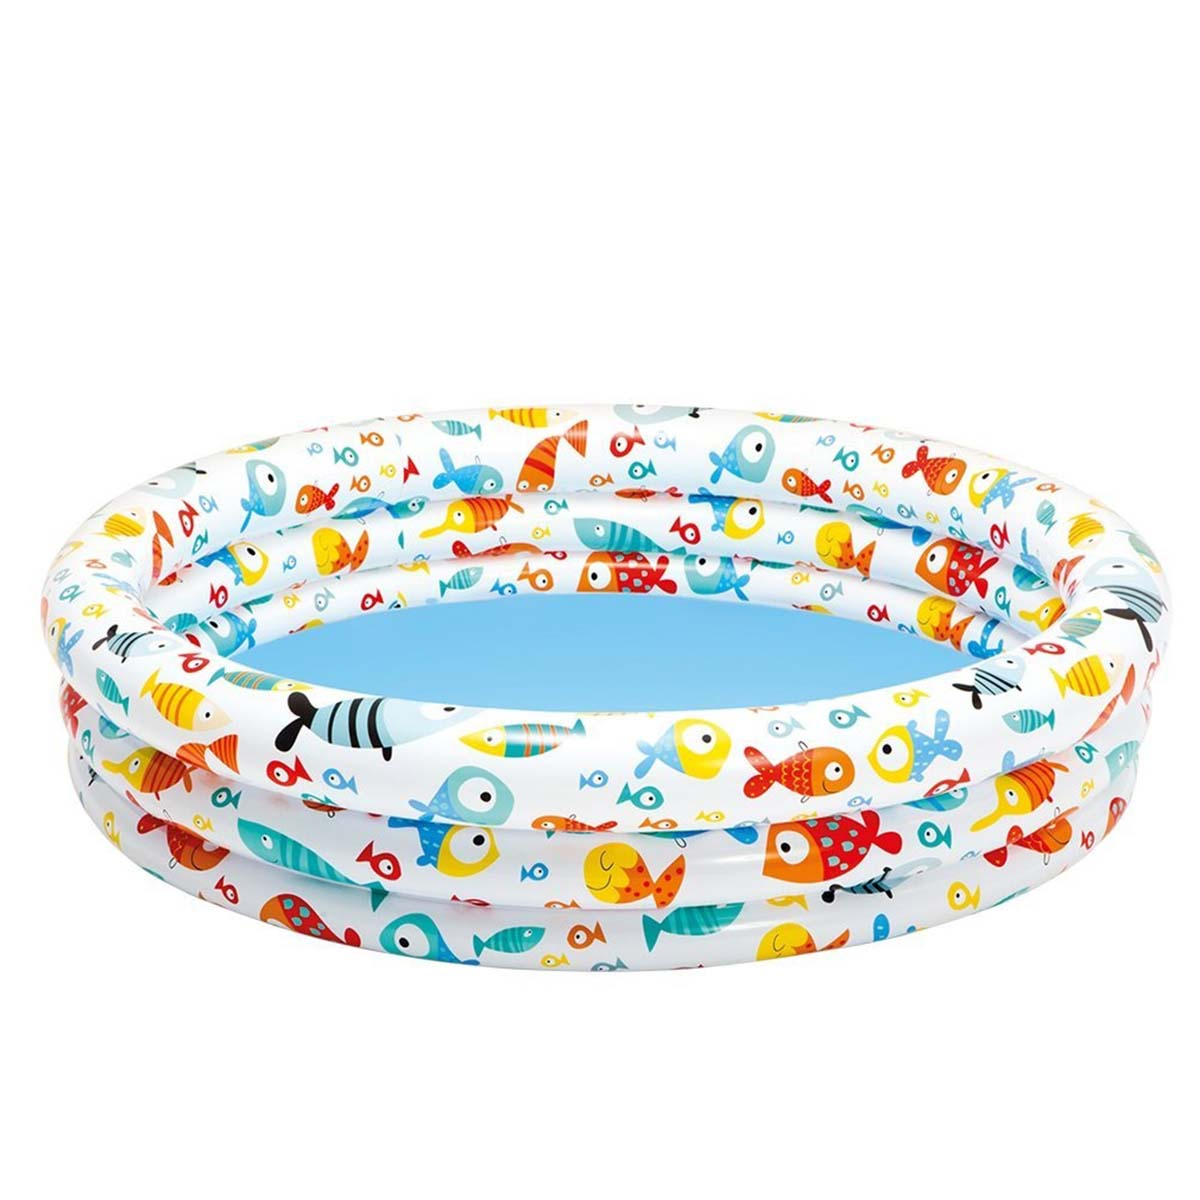 Intex Fishbowl Pool kinderzwembad 132 x 28 cm